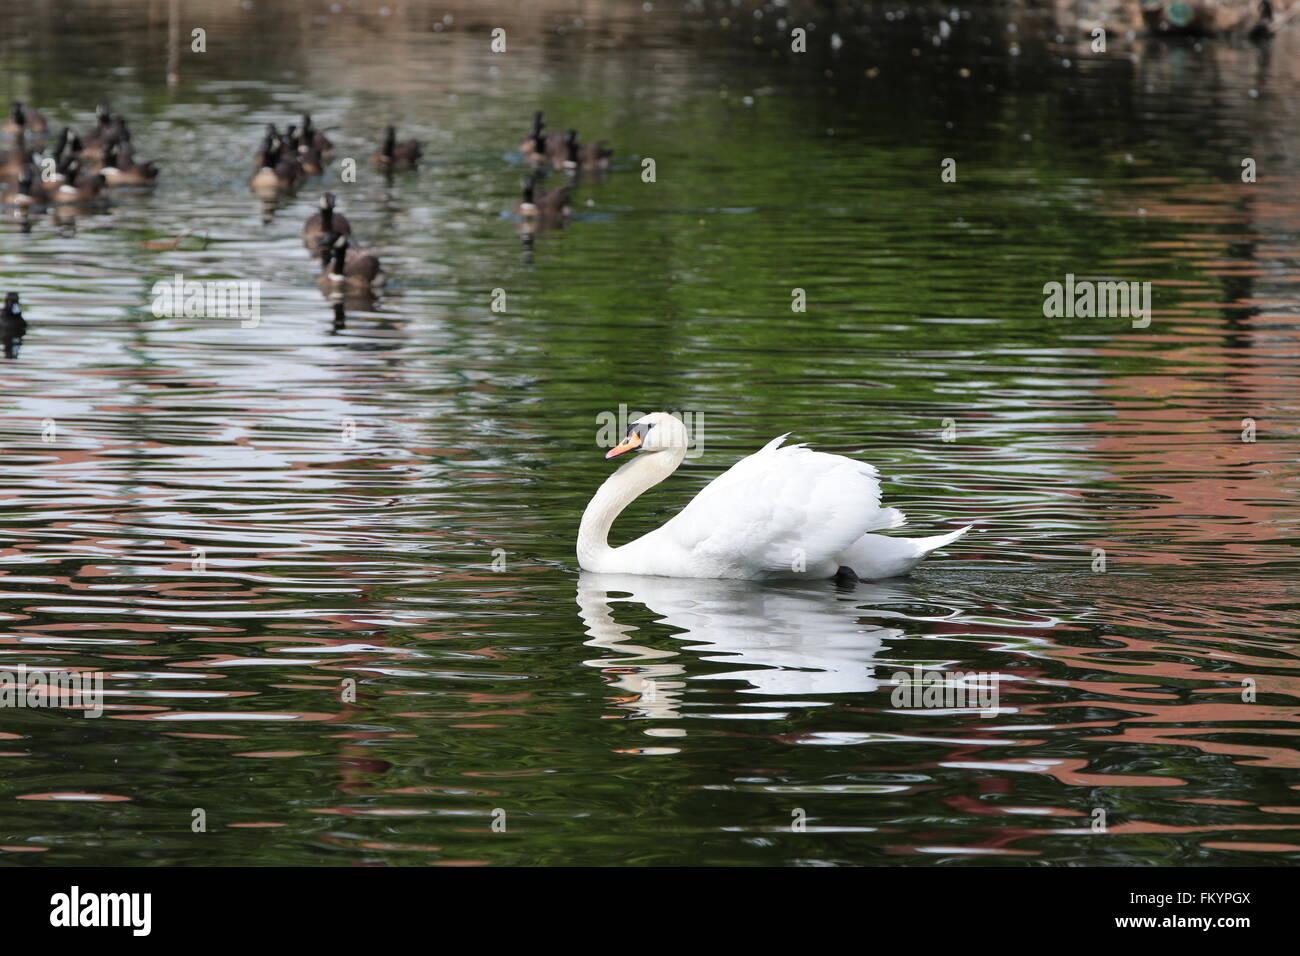 mute swan (Cygnus olor) on water - Stock Image